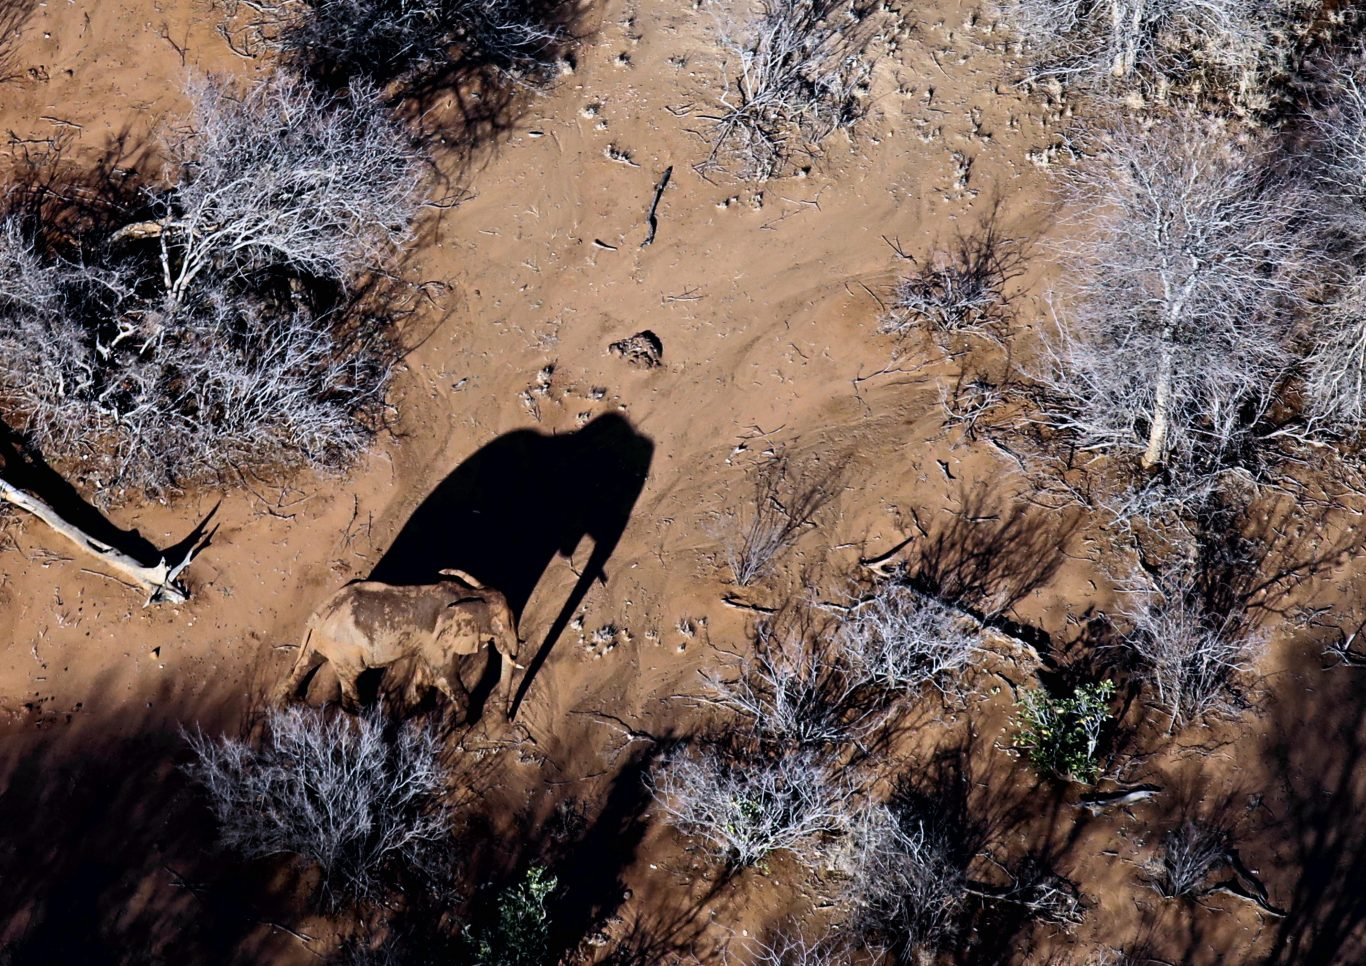 Protecting Kenya's elephants with drones